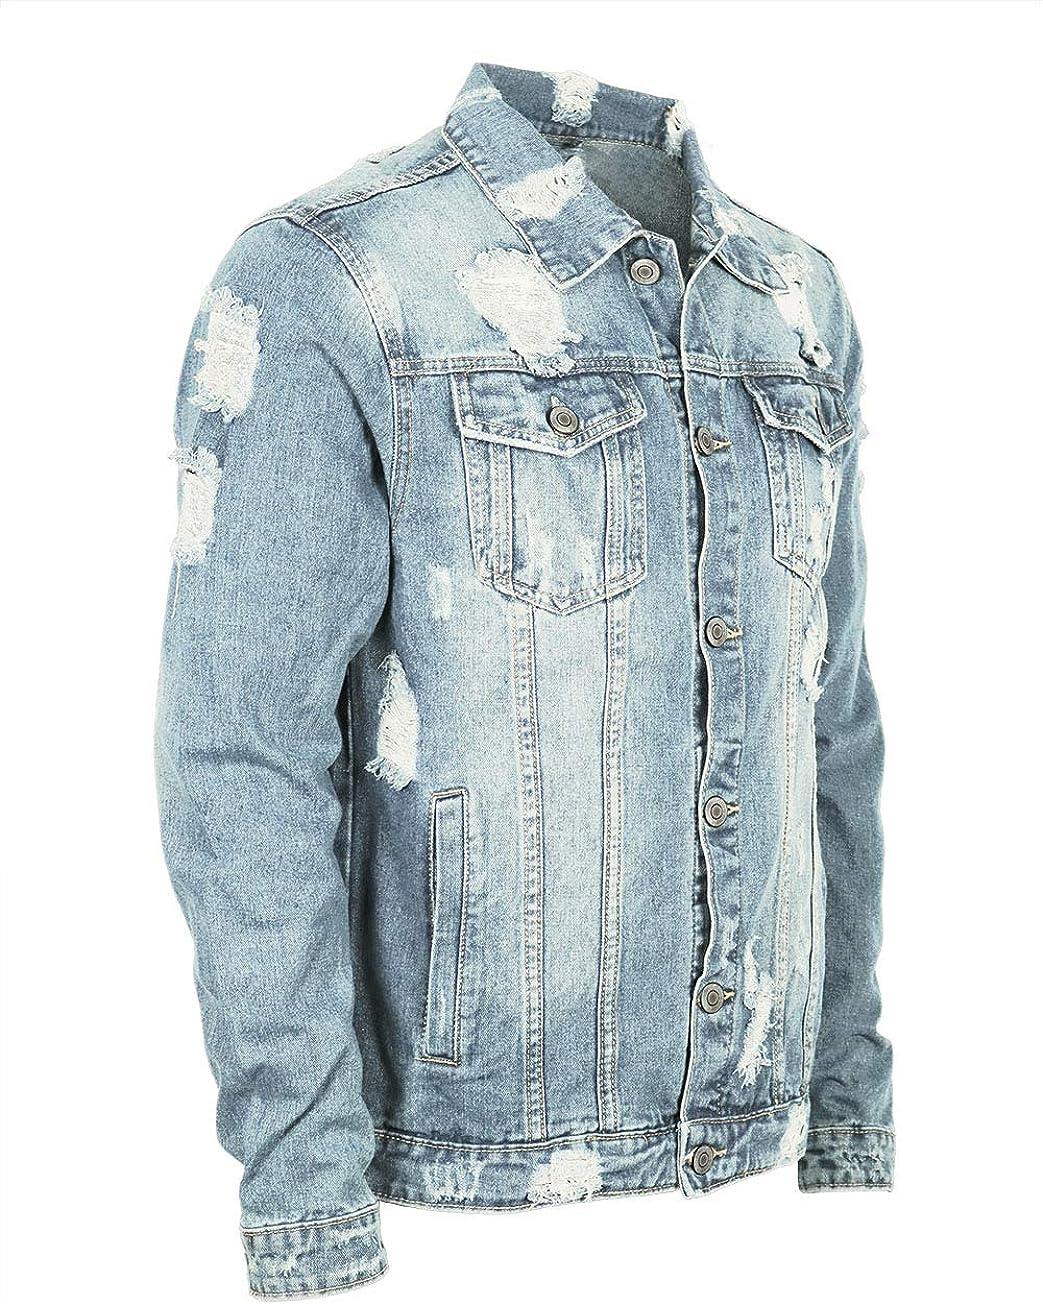 URBANJ Men's Distressed Denim Jacket